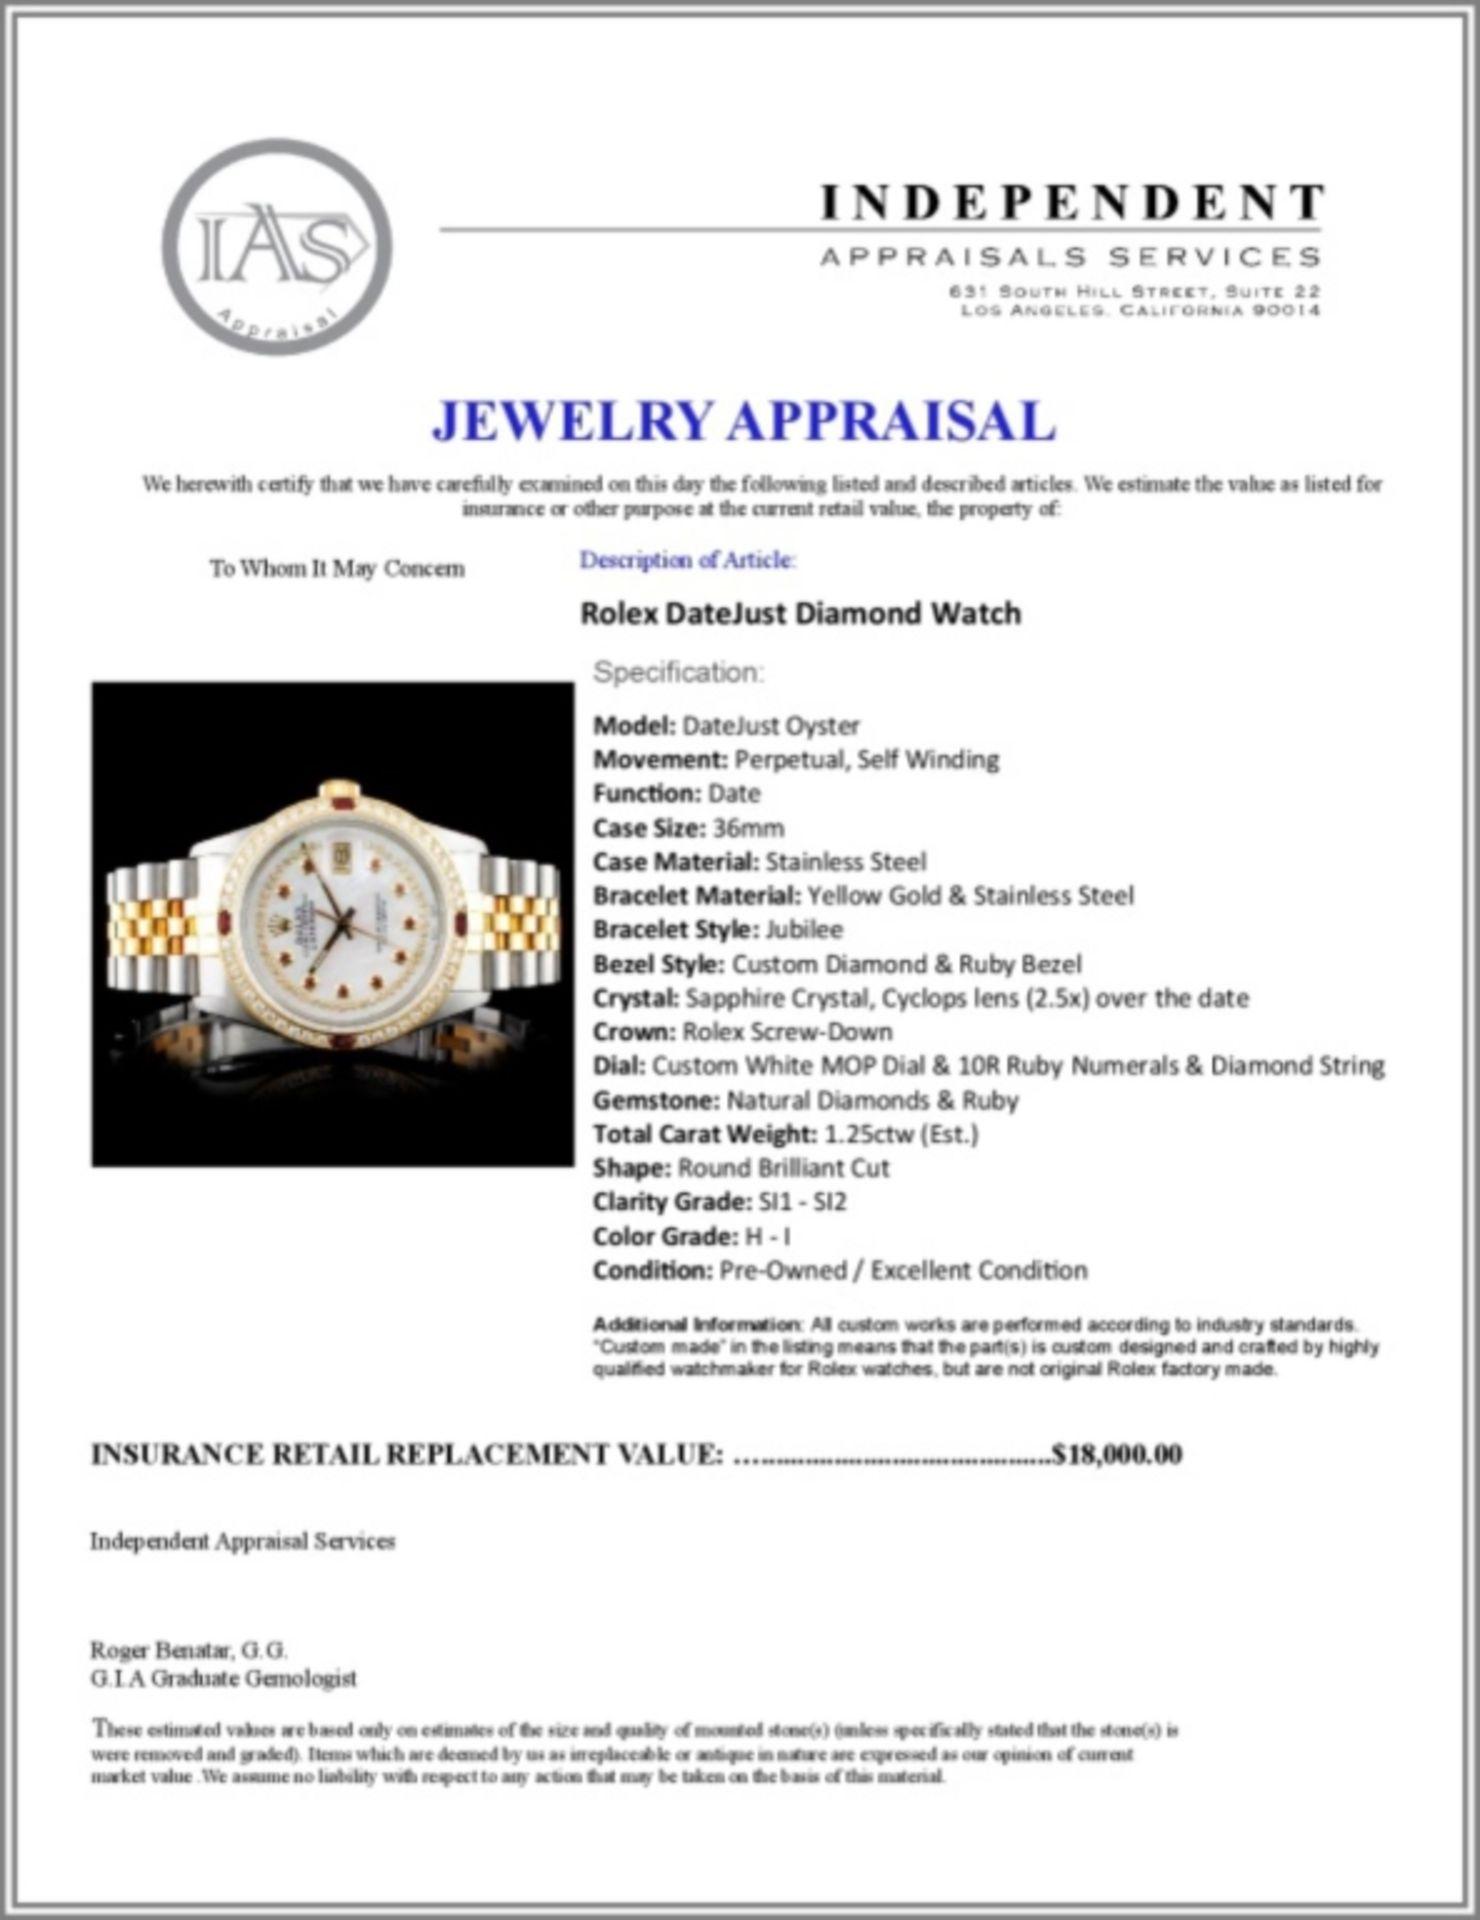 Rolex DateJust 18K/SS Diamond 36mm Watch - Image 5 of 5